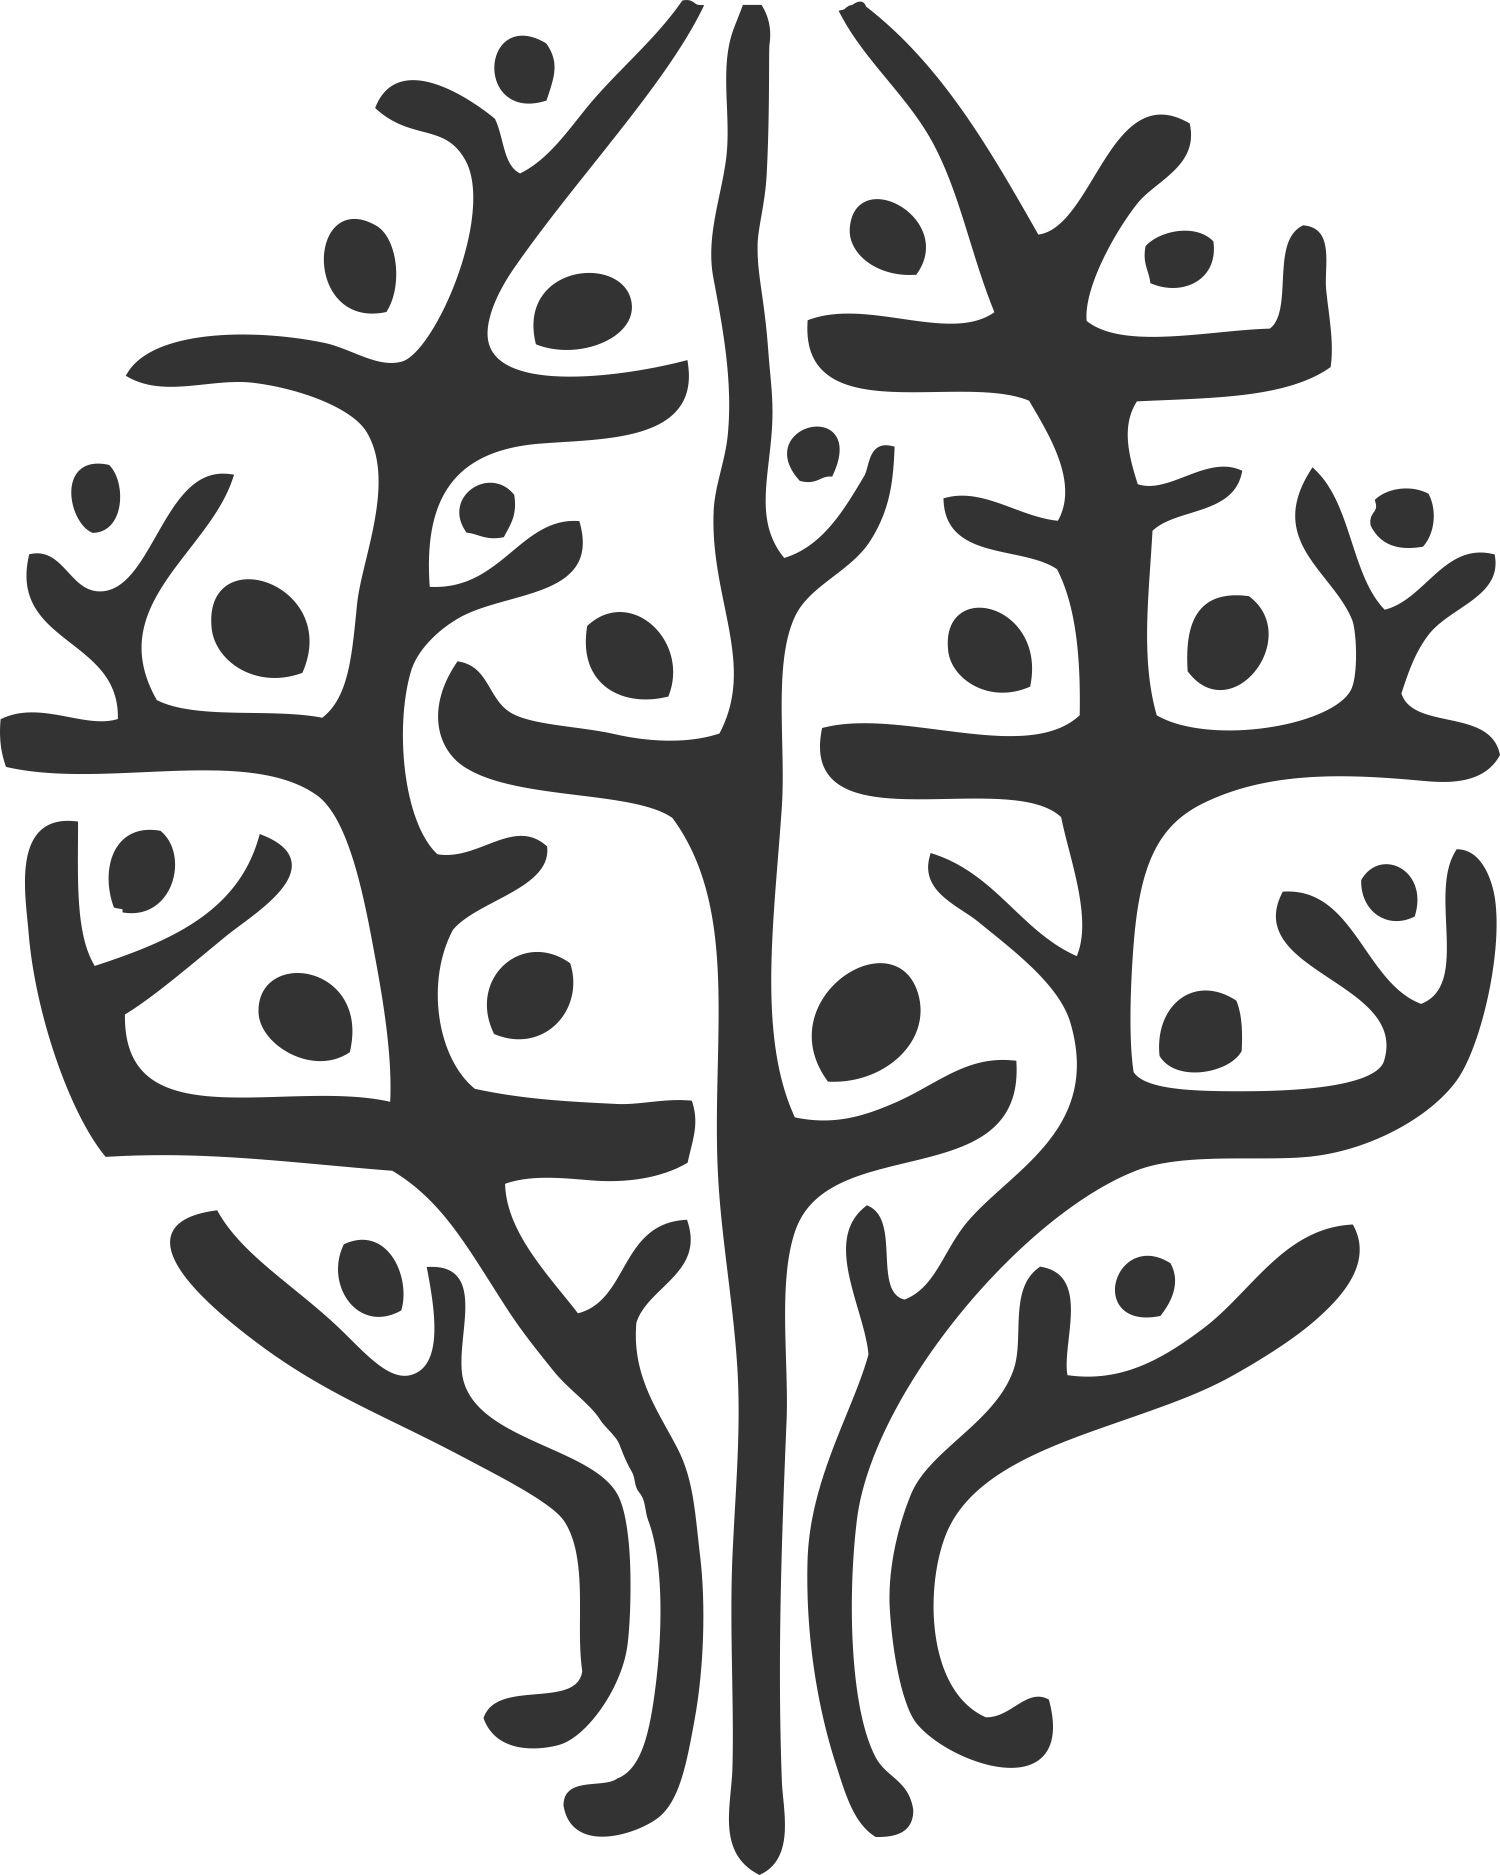 Universe Oneness Gaia Symbol